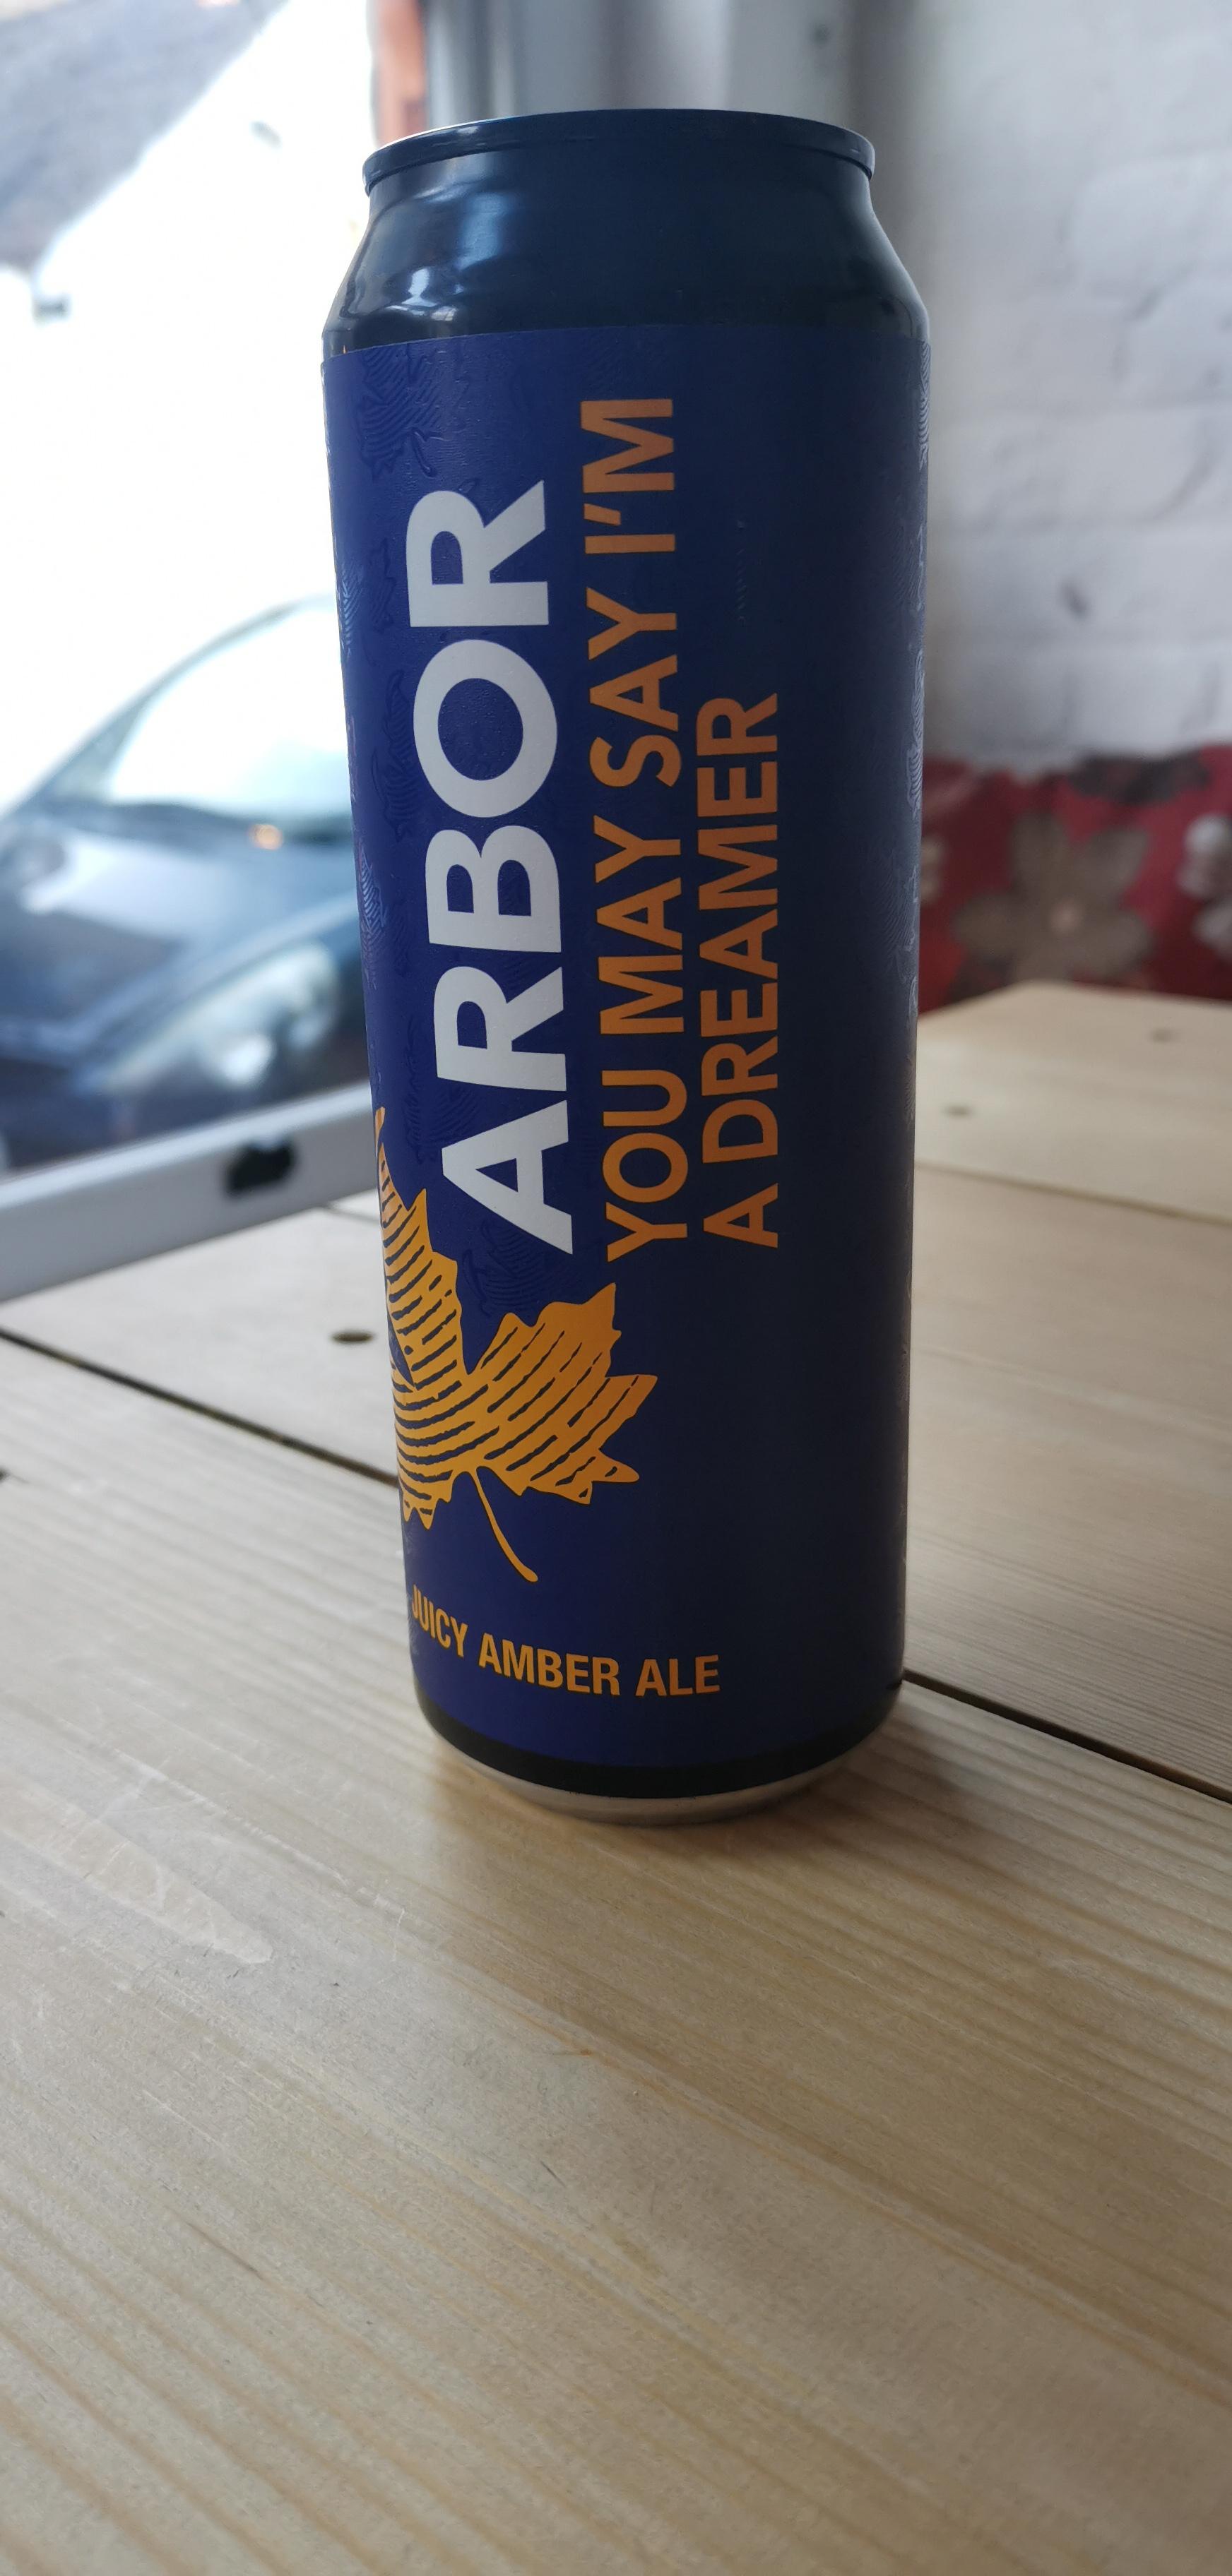 Arbor Ales - You May Say I'm A Dreamer (4.6% Juicy Amber Ale)